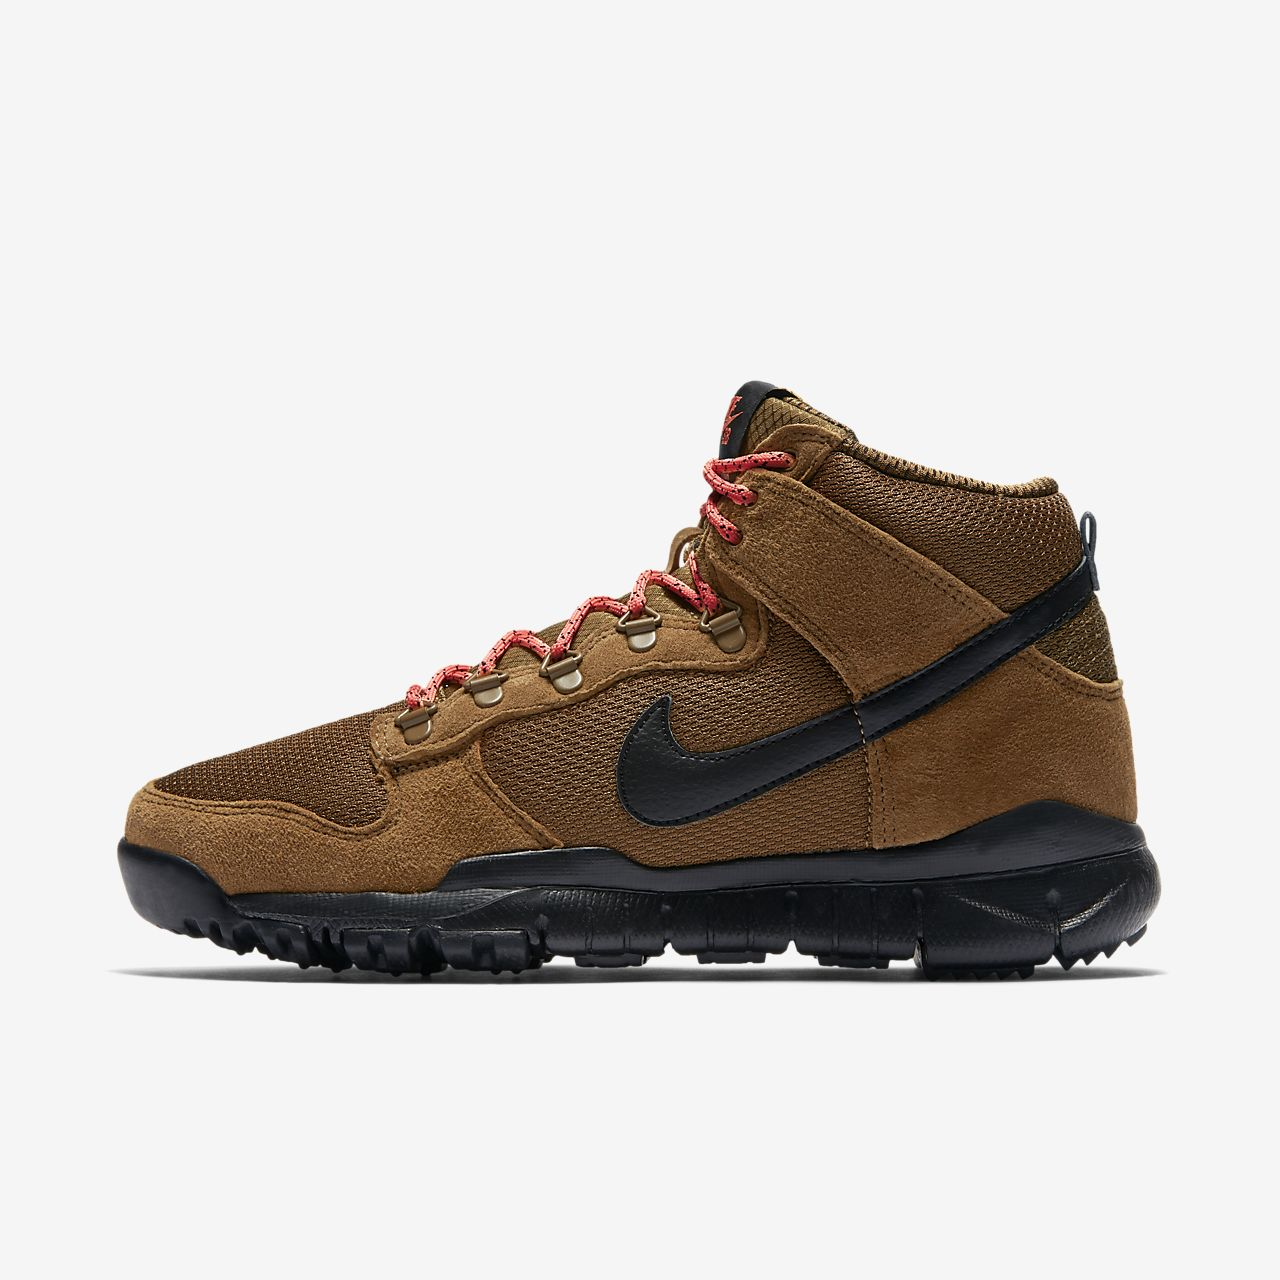 Nike Sb Dunk High Boot Shoes